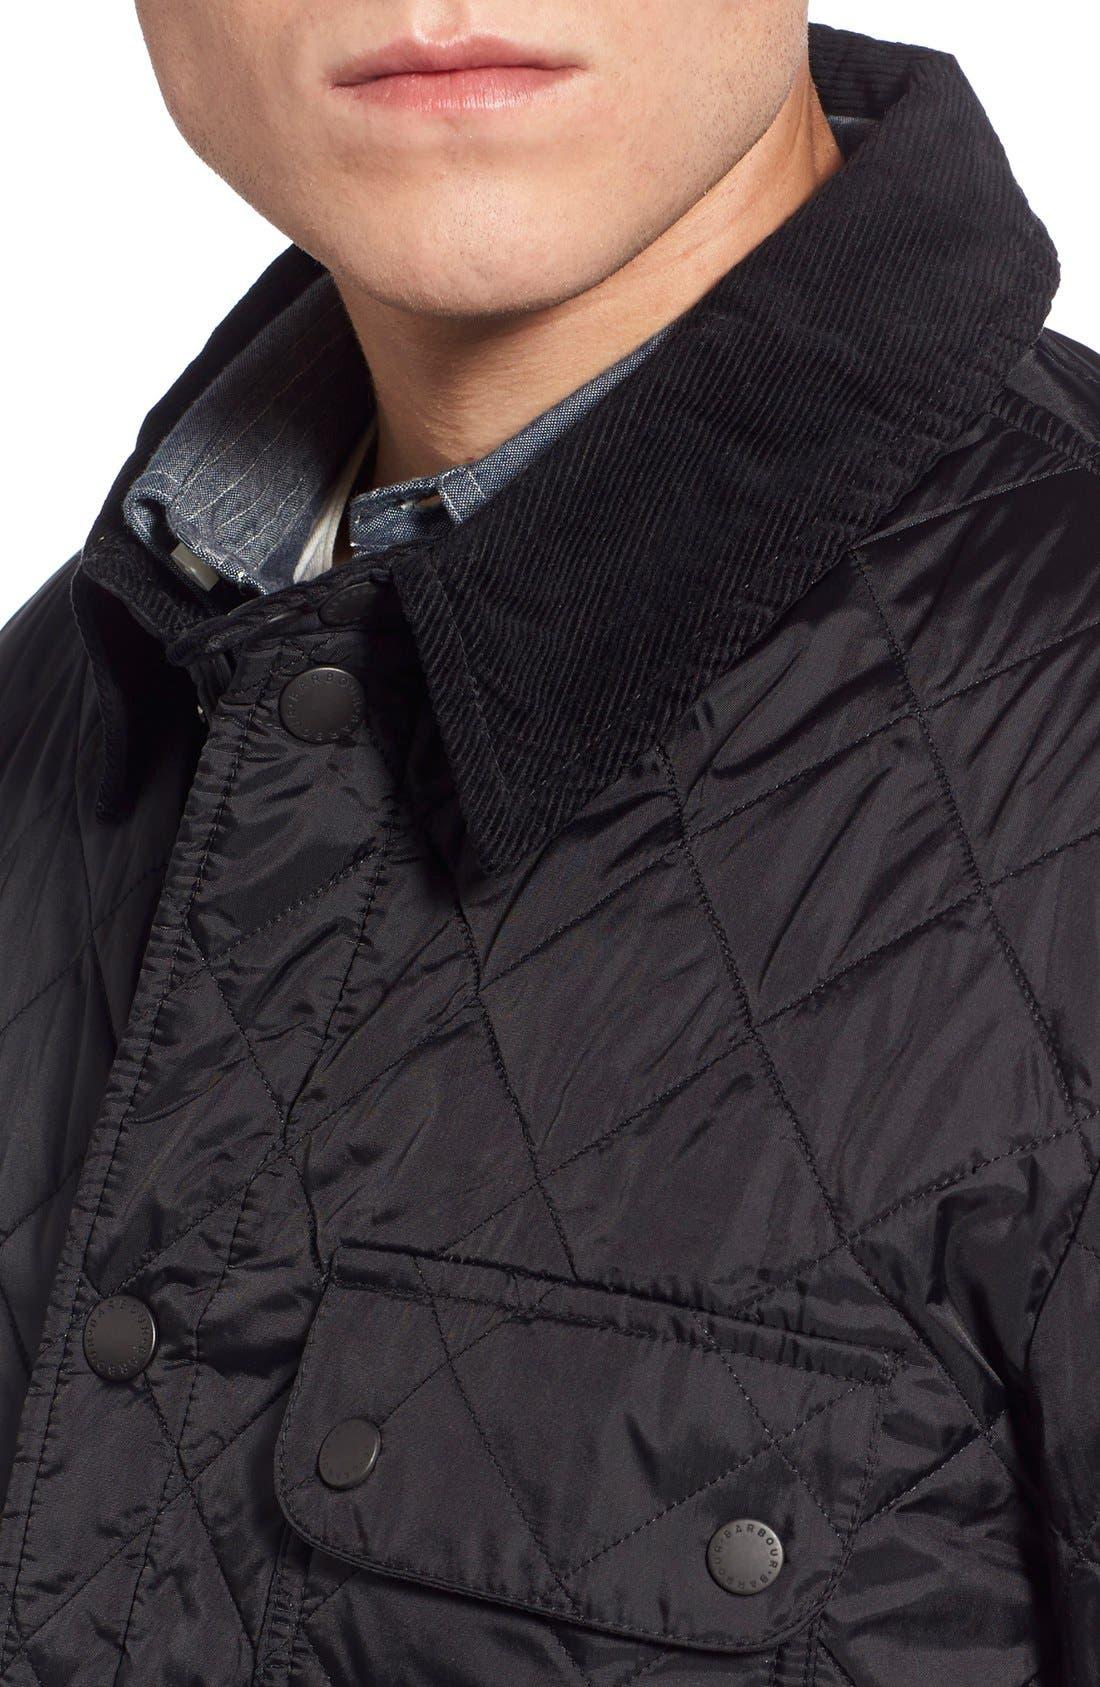 BARBOUR, 'Tinford' Regular Fit Quilted Jacket, Alternate thumbnail 4, color, 001